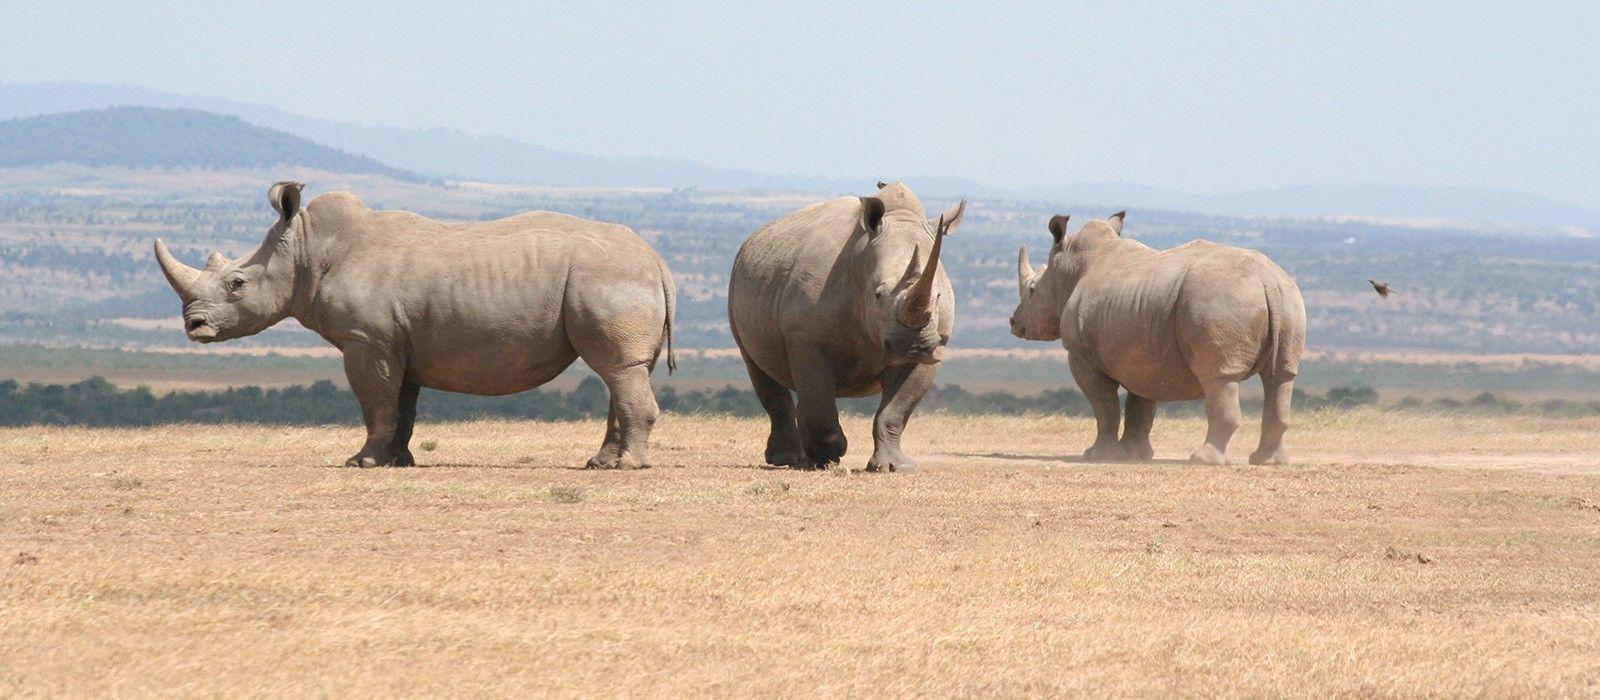 Destination Meru National Park Kenya